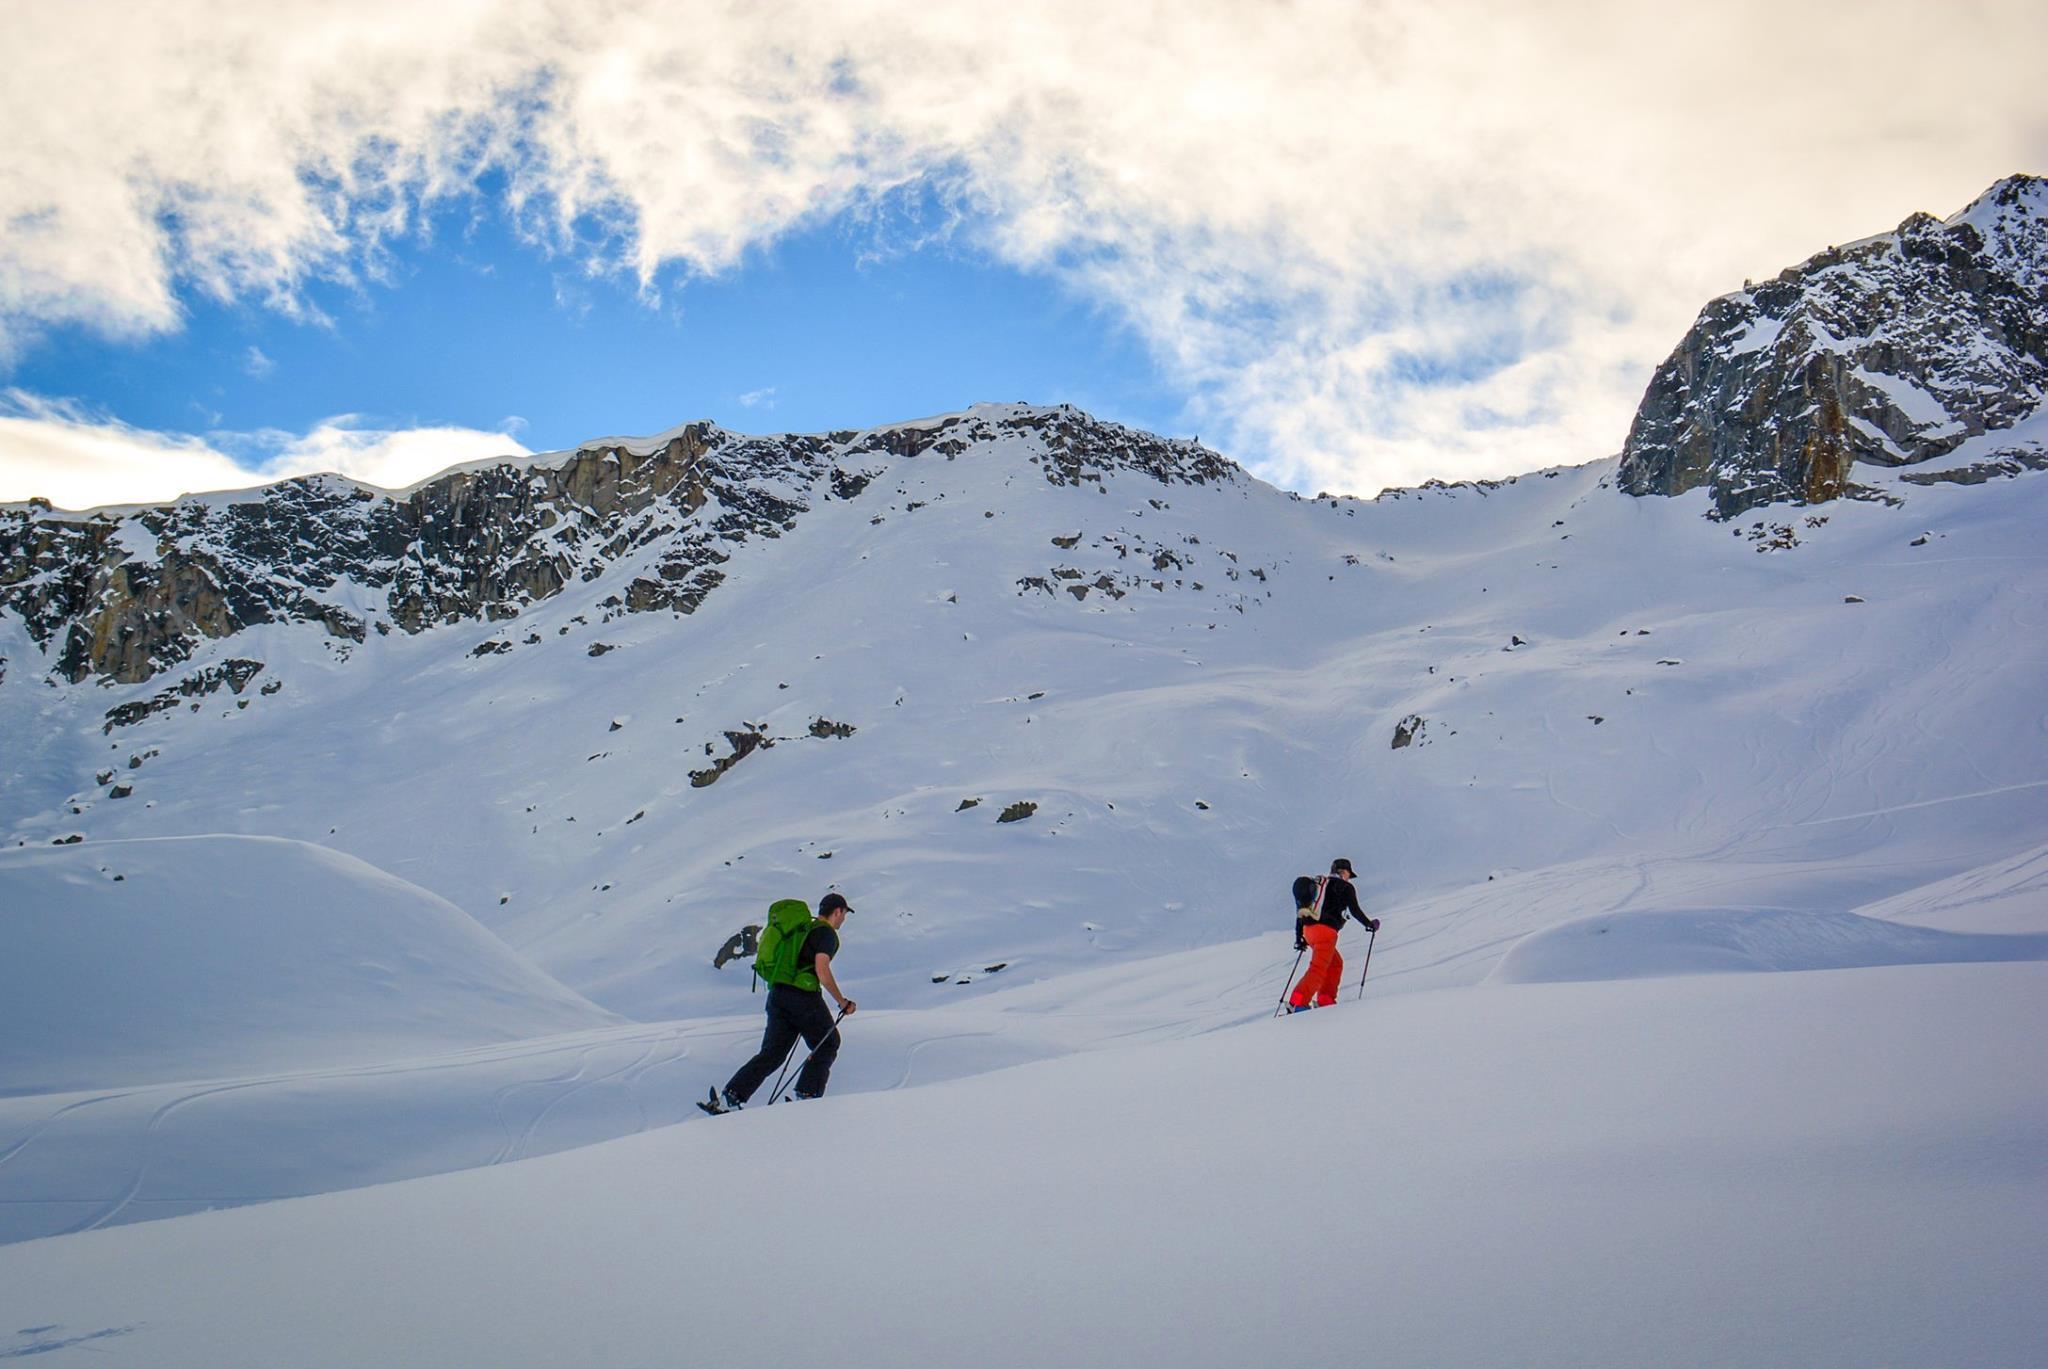 Ski Touring in British Columbia, Photo: Megan Wilson